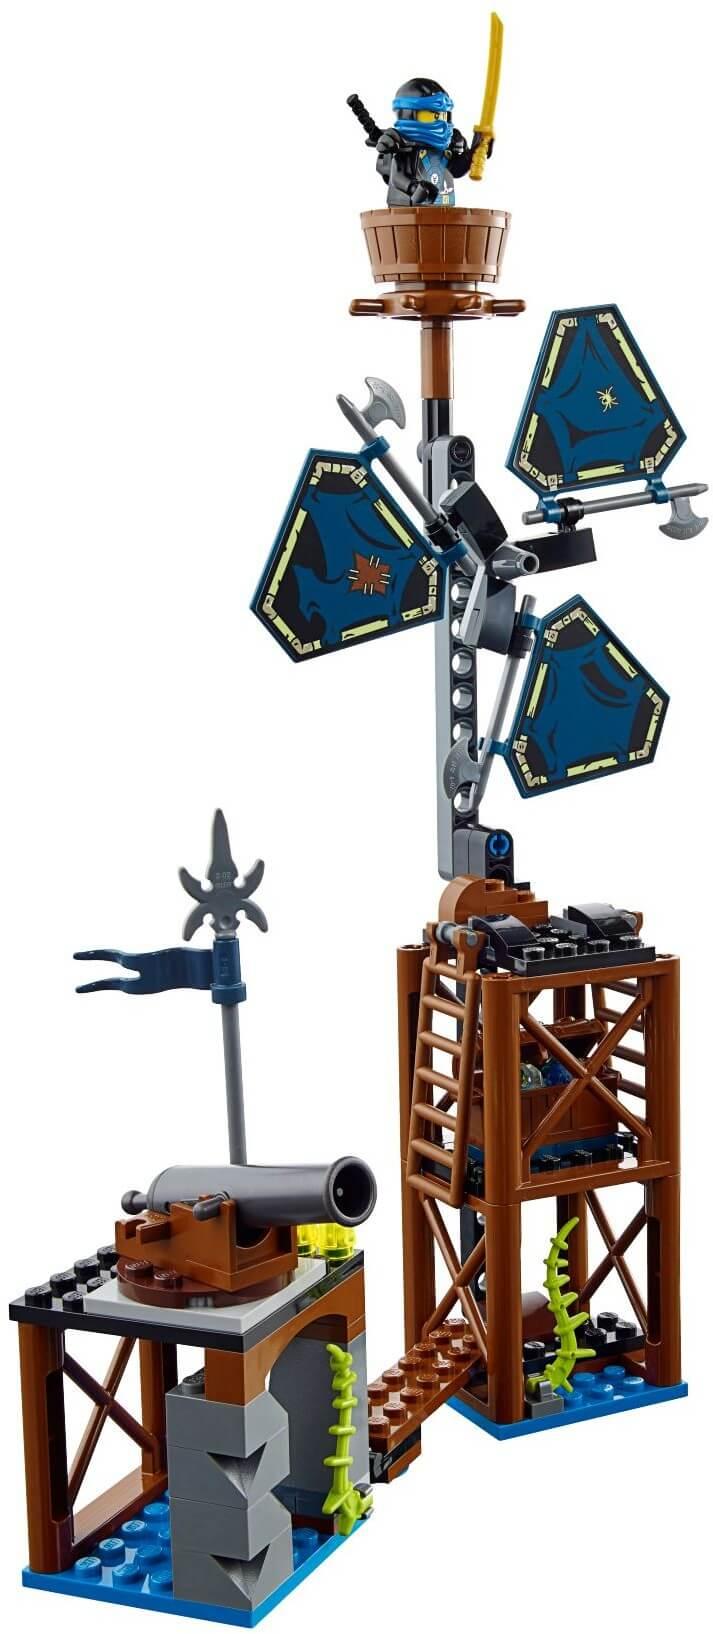 Mua đồ chơi LEGO 70732 - LEGO Ninjago 70732 - Thành phố Ma Stiix (LEGO Ninjago City of Stiix 70732)